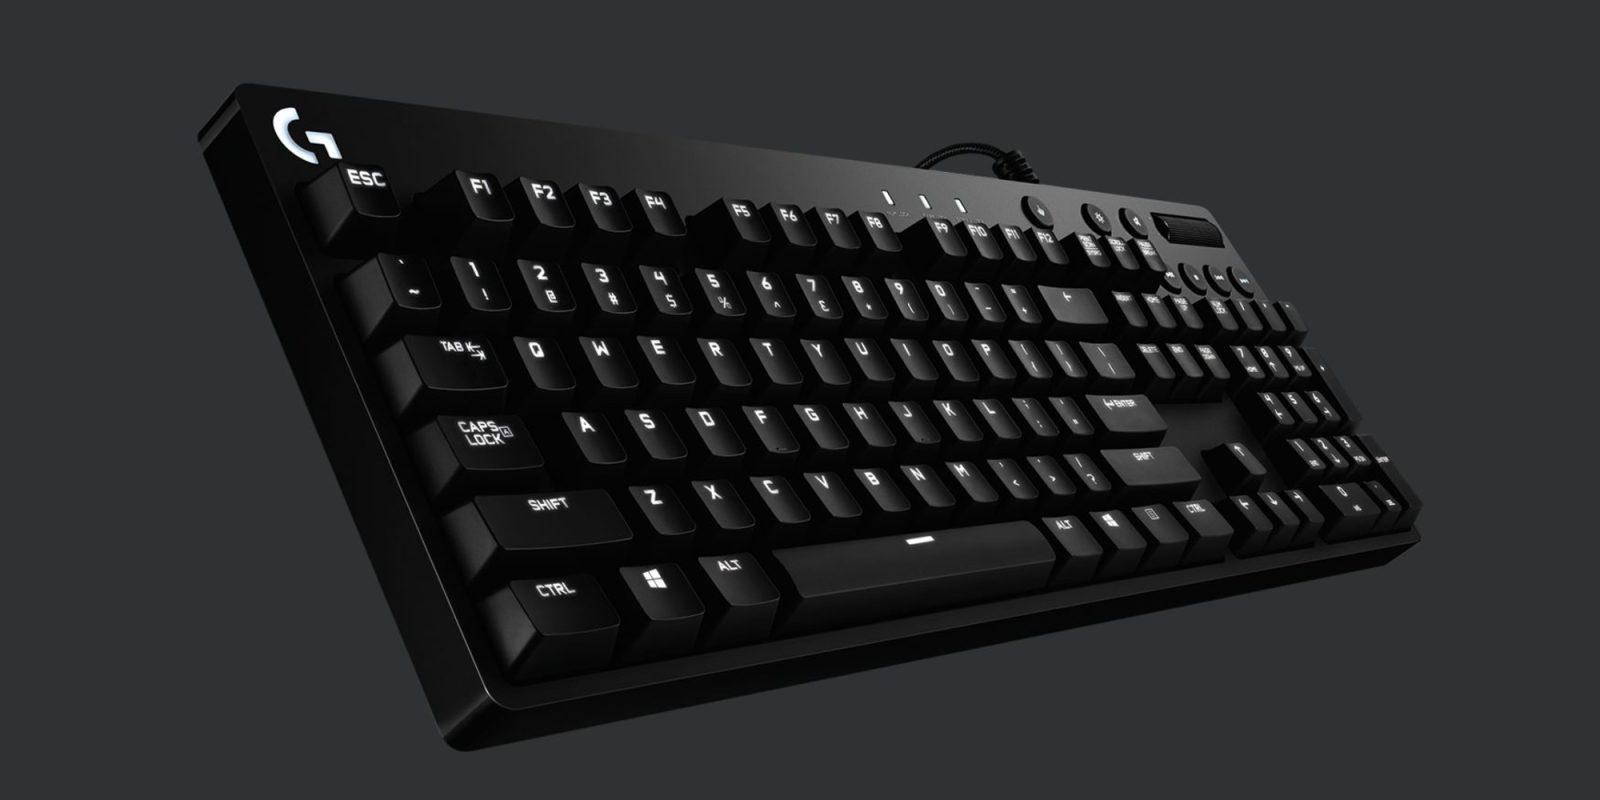 13b168e5fb7 Logitech's Orion Backlit Mechanical Keyboard drops to $65 (Reg. $90), more  from $120